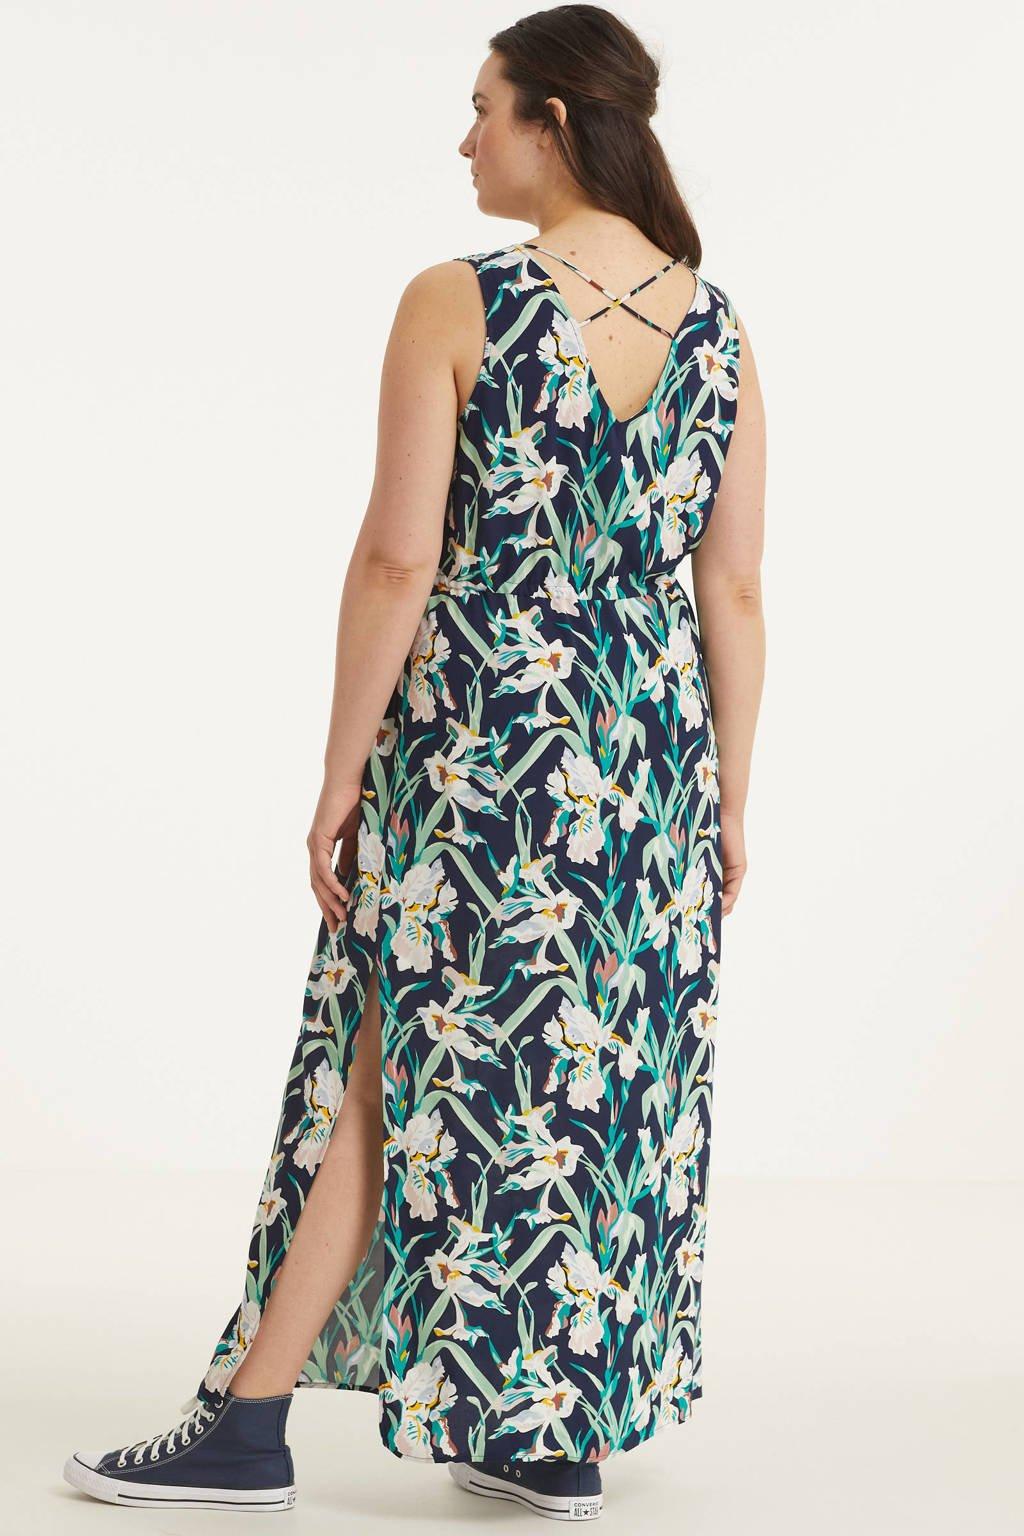 VERO MODA CURVE maxi jurk VMSIMPLYEASY met bladprint donkerblauw/groen/wit, Donkerblauw/groen/wit